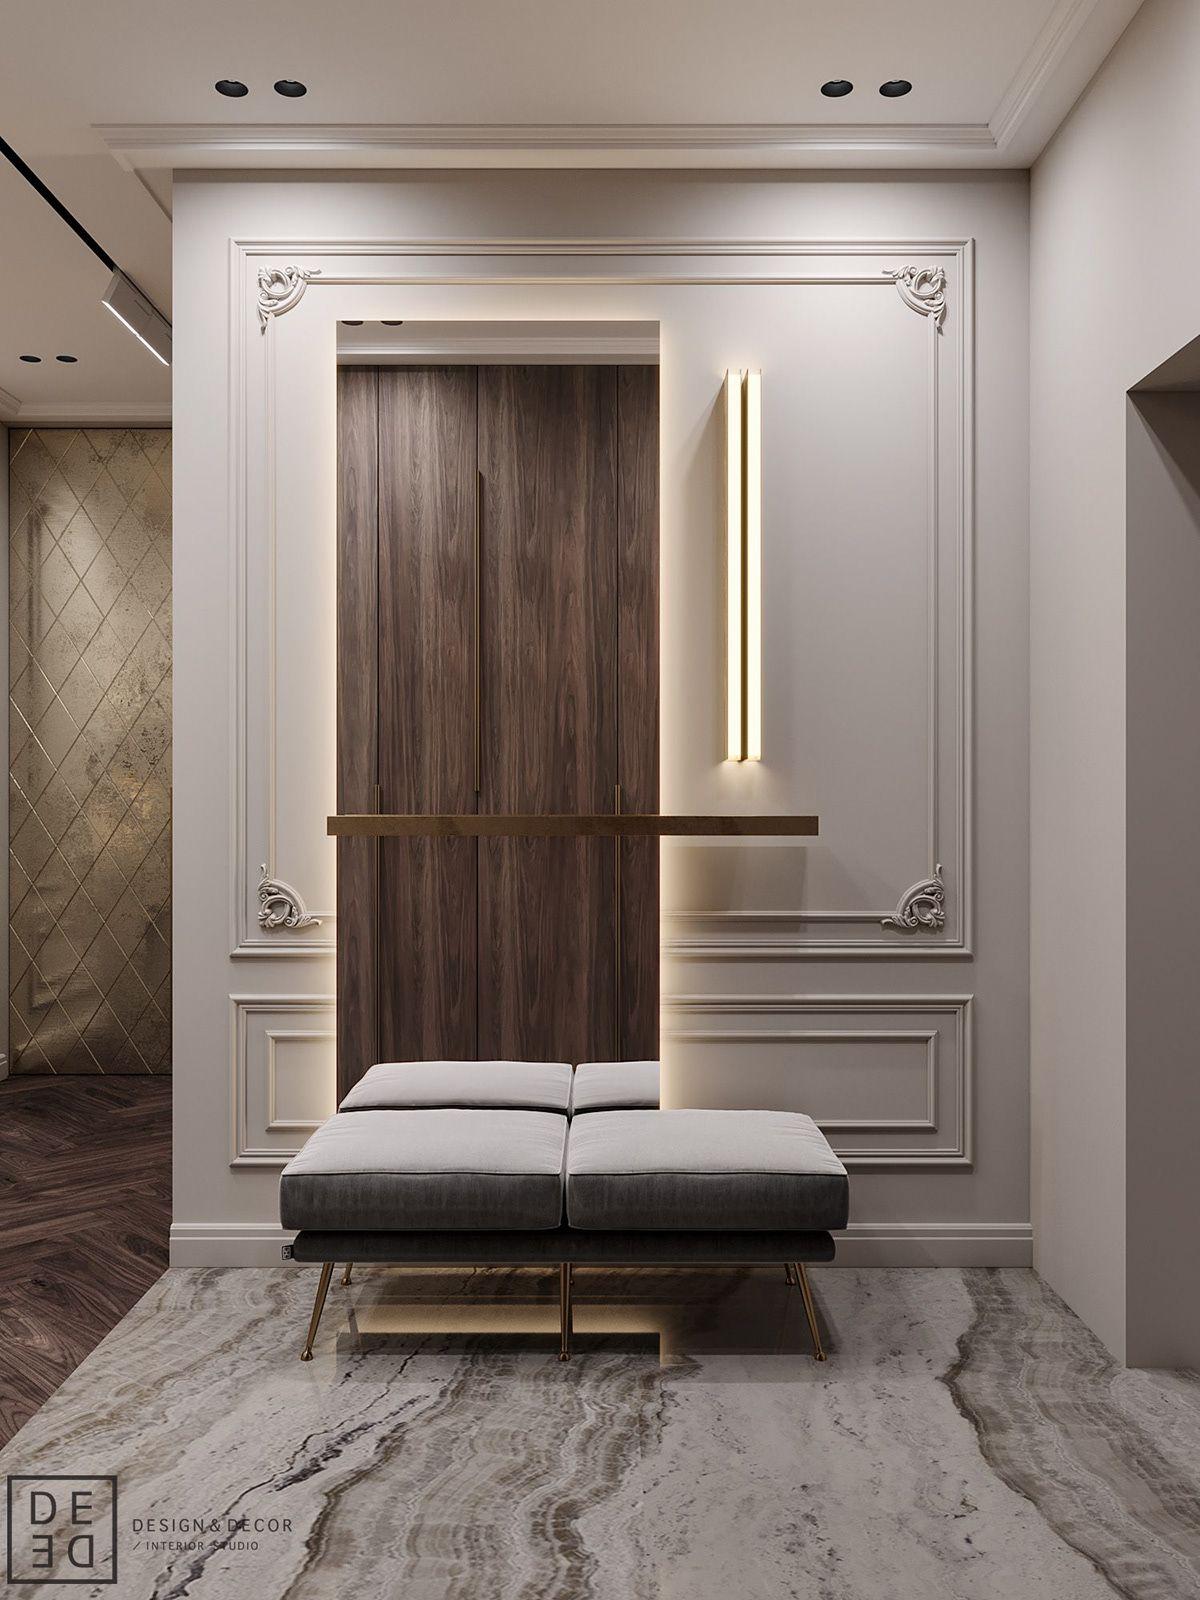 De De Blueberry Flat On Behance Foyer Design Luxury Home Decor